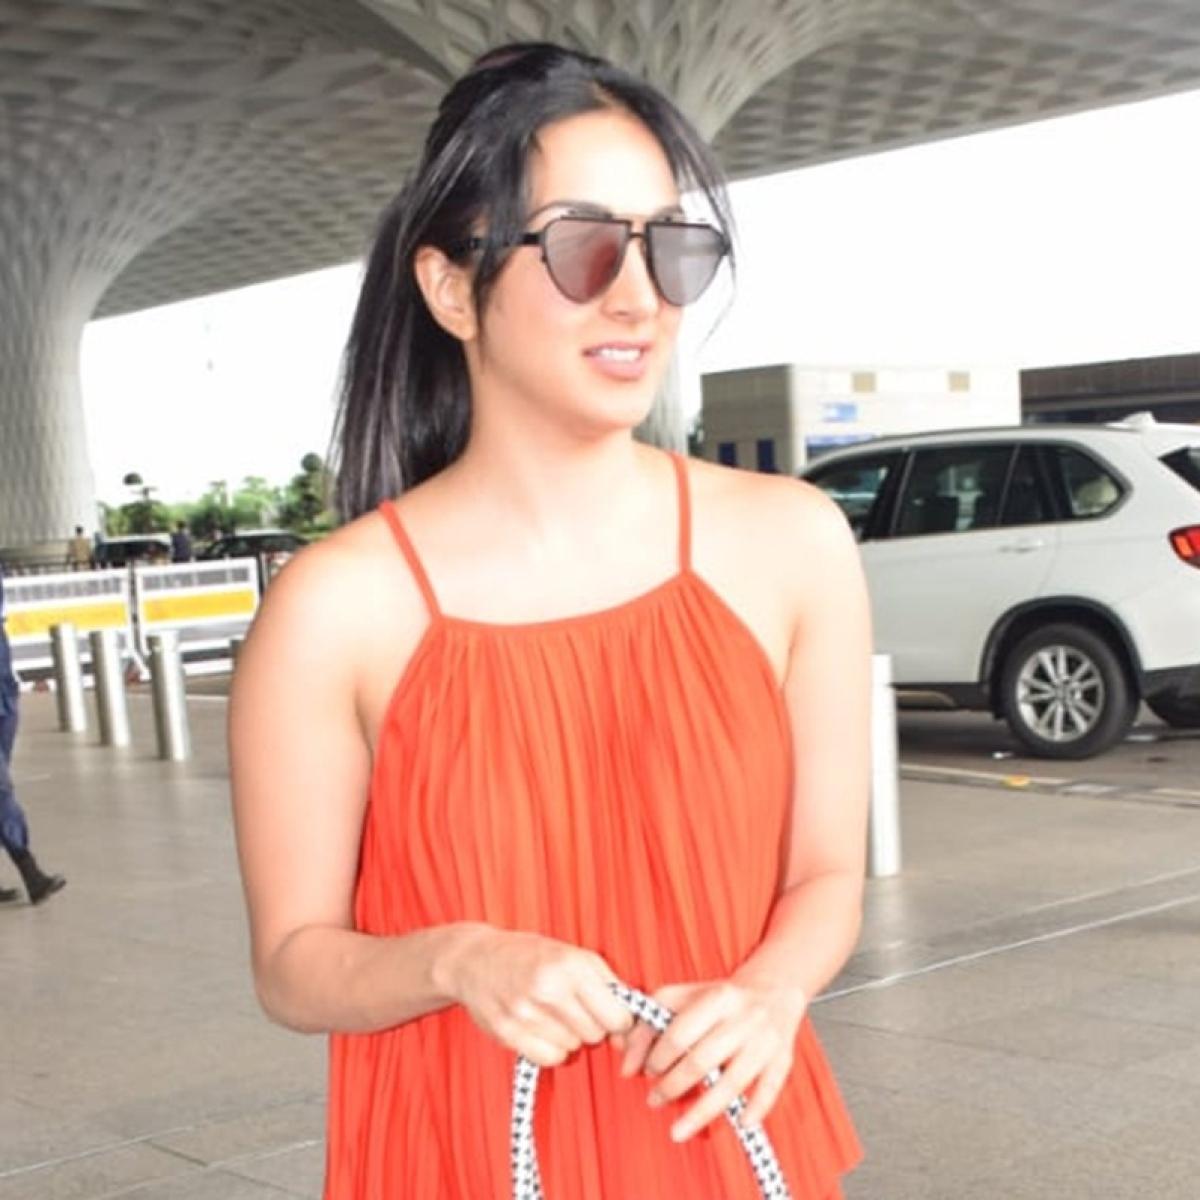 Kiara Advani sports Christian Dior tote bag worth Rs 1.8 Lakh!